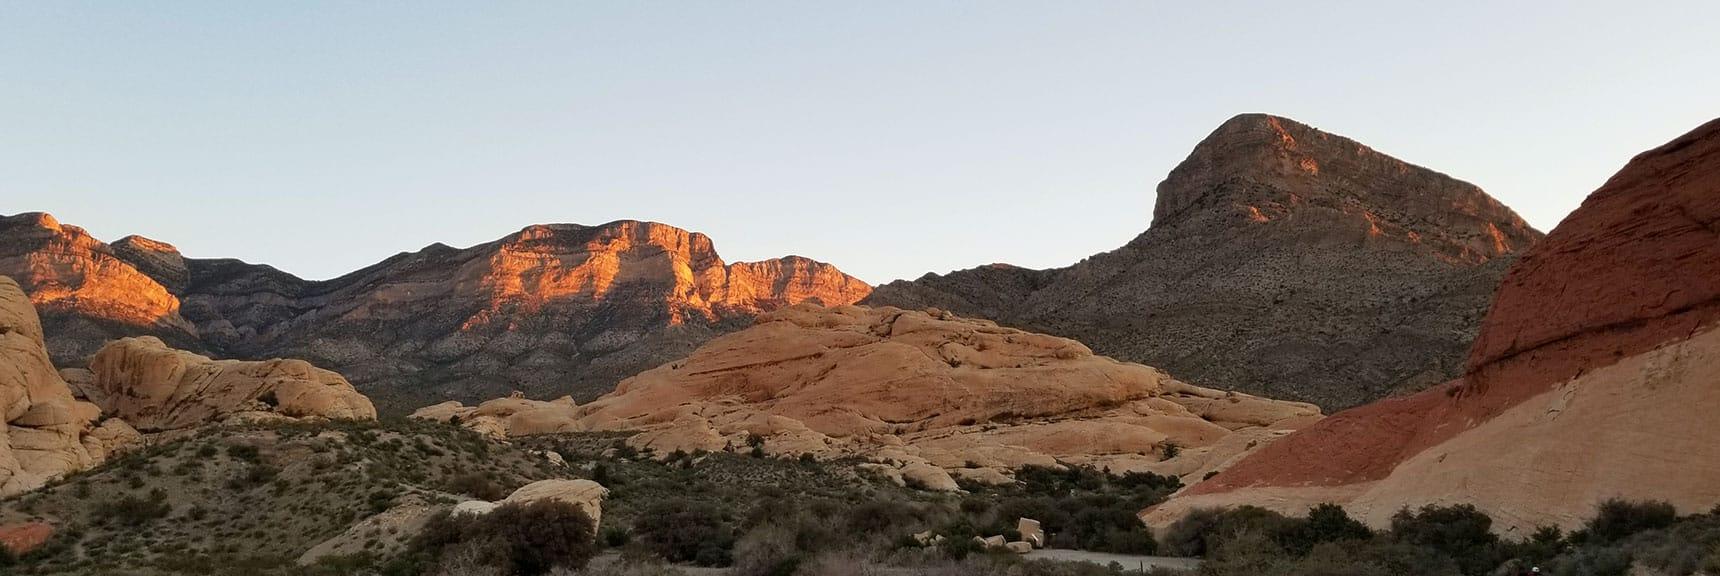 La Madre Mountain Sunrise, Red Rock Park, Nevada